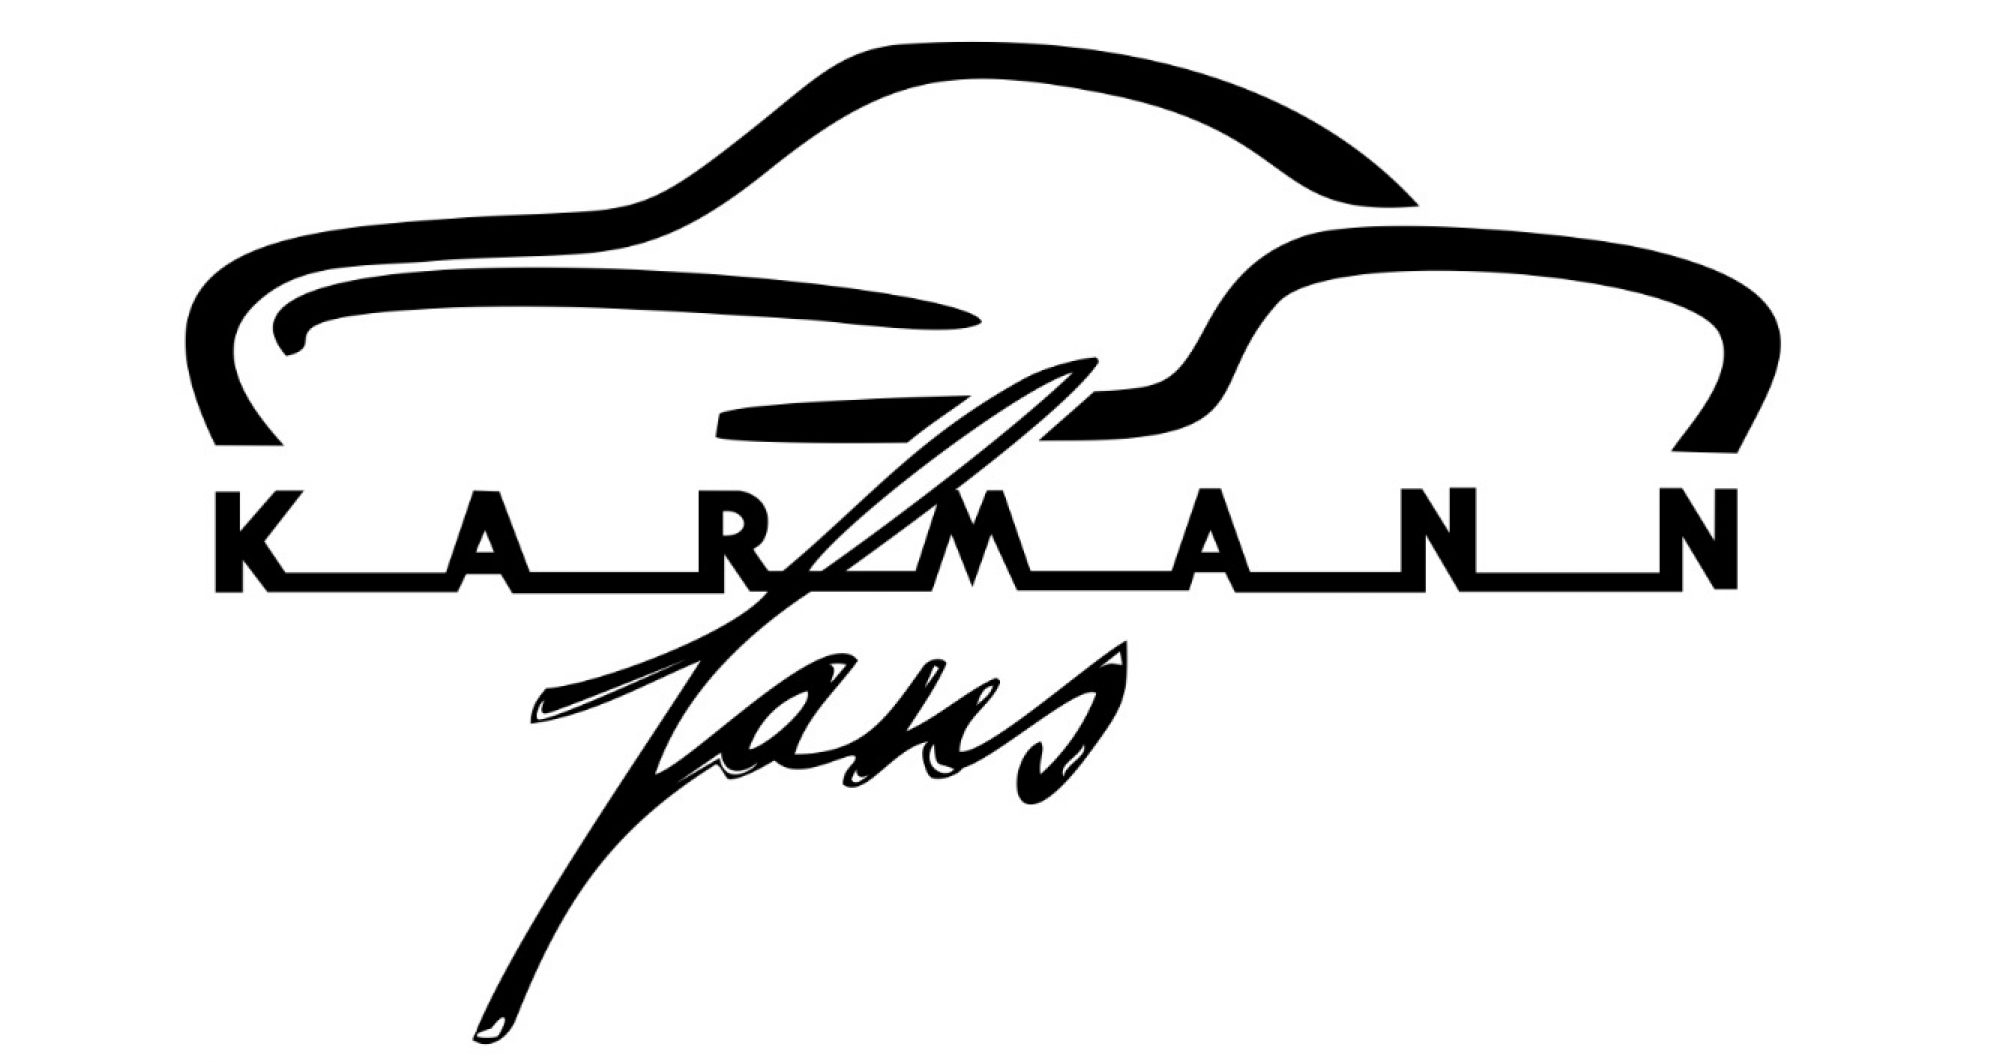 Karmannfans – Der Blog für alle Fans des VW Karmann Ghia